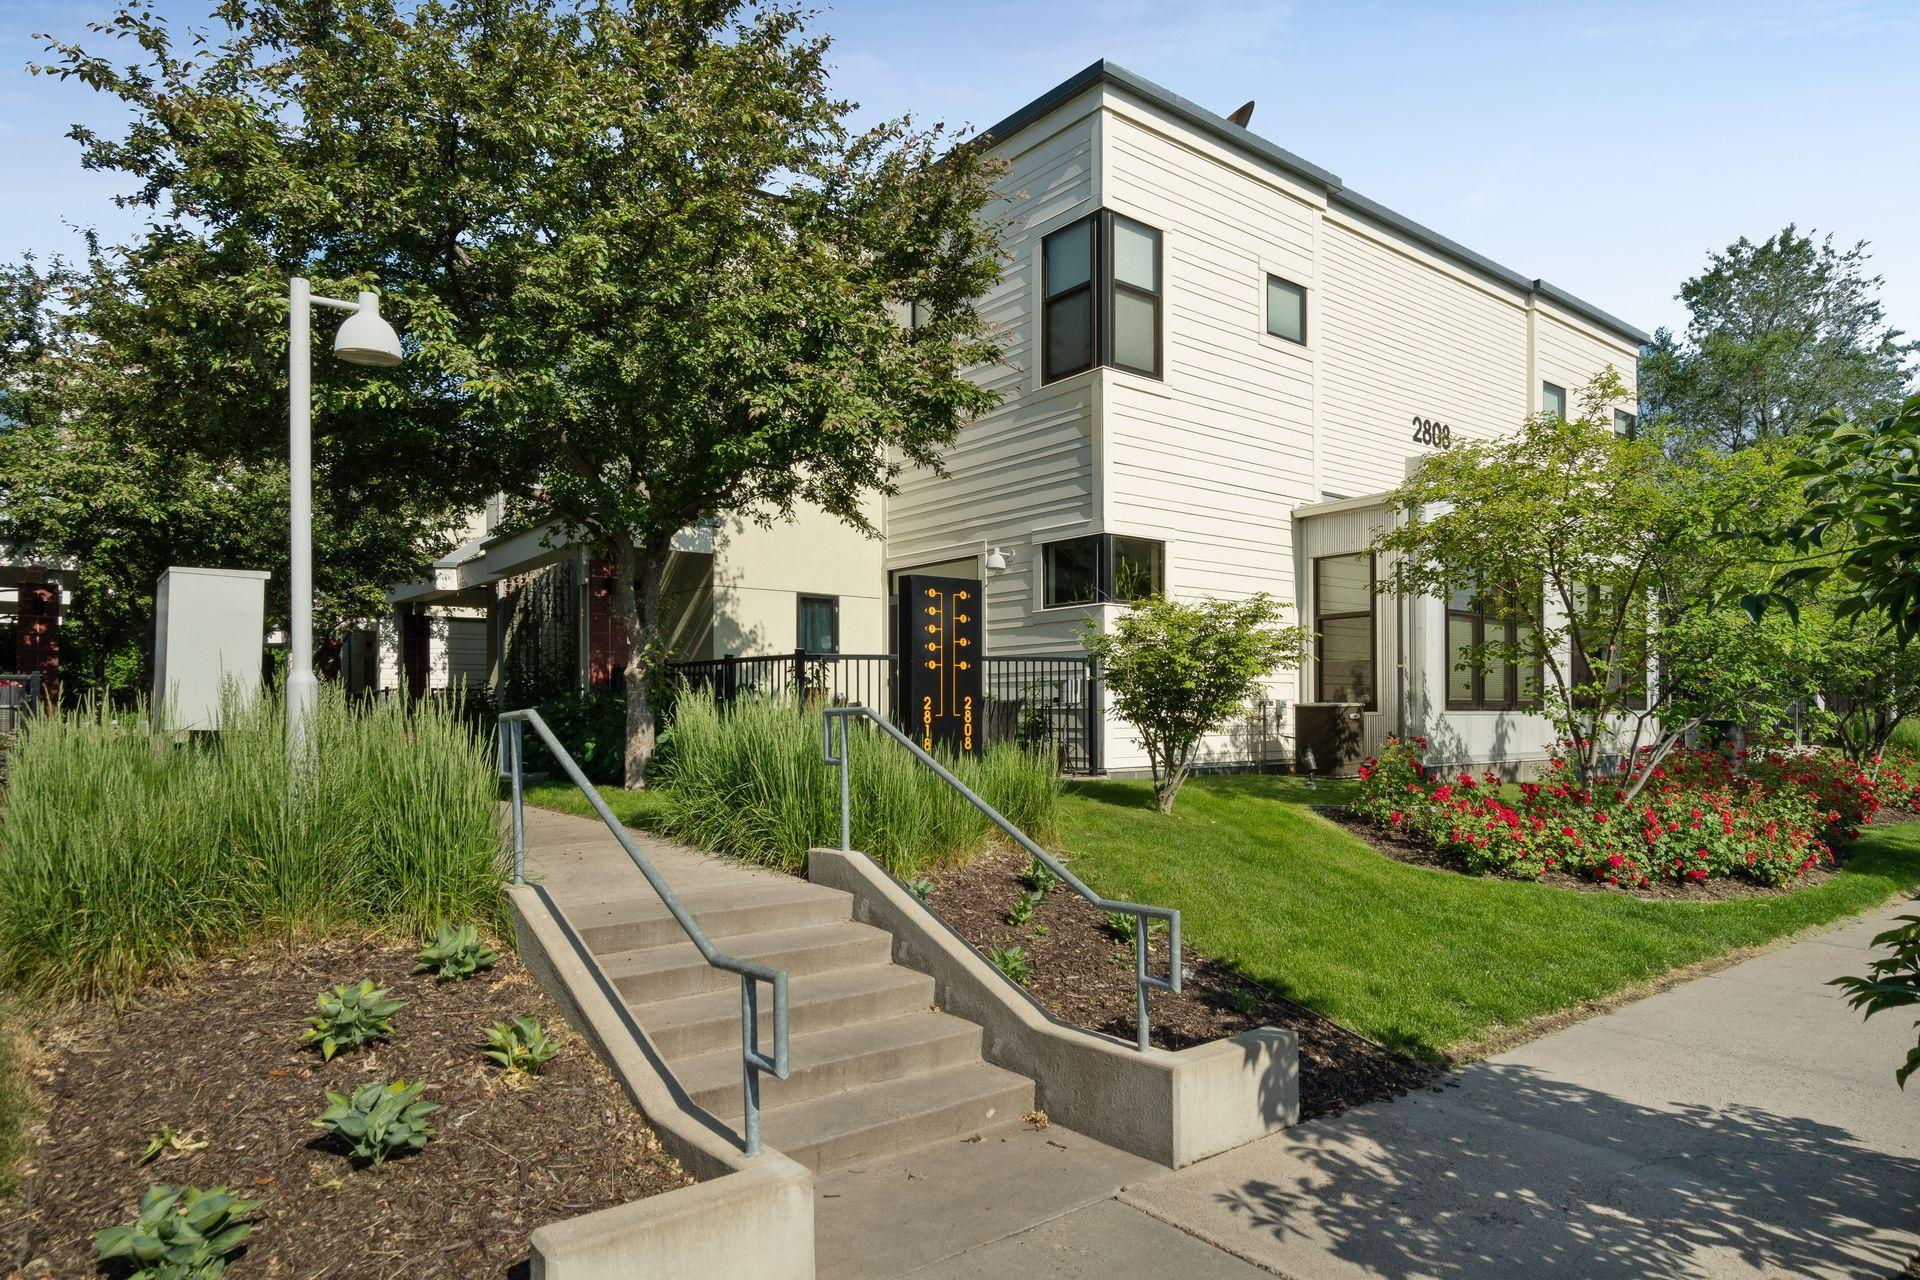 2808 Aldrich Avenue, Minneapolis, Minnesota 55408, 2 Bedrooms Bedrooms, ,1 BathroomBathrooms,Residential,For Sale,Aldrich ,NST6114942